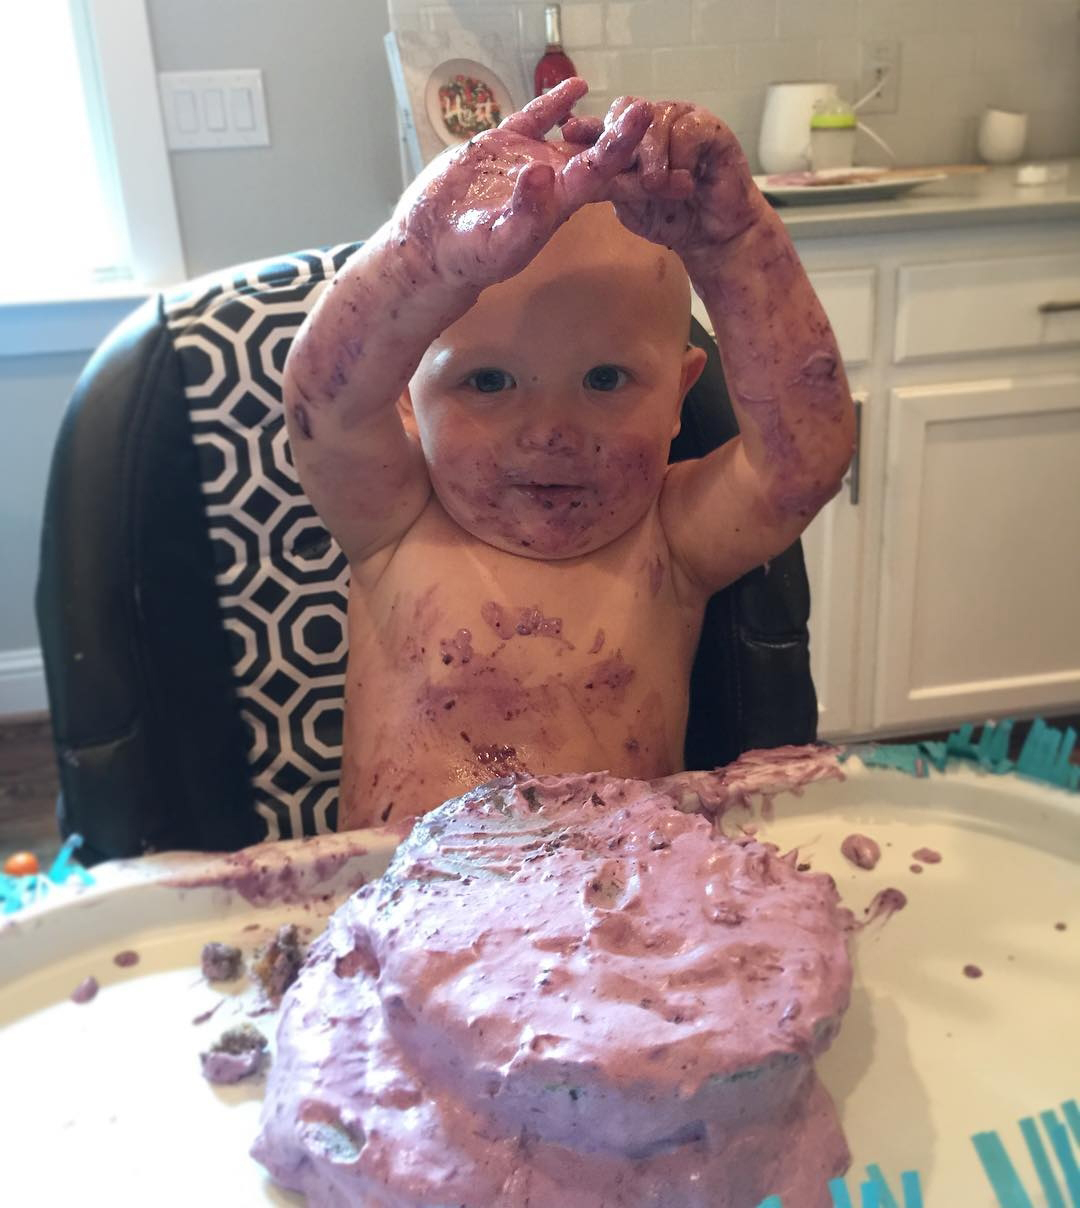 Catherine Giudici and Sean Lowe Family Album - Happy 1st birthday!